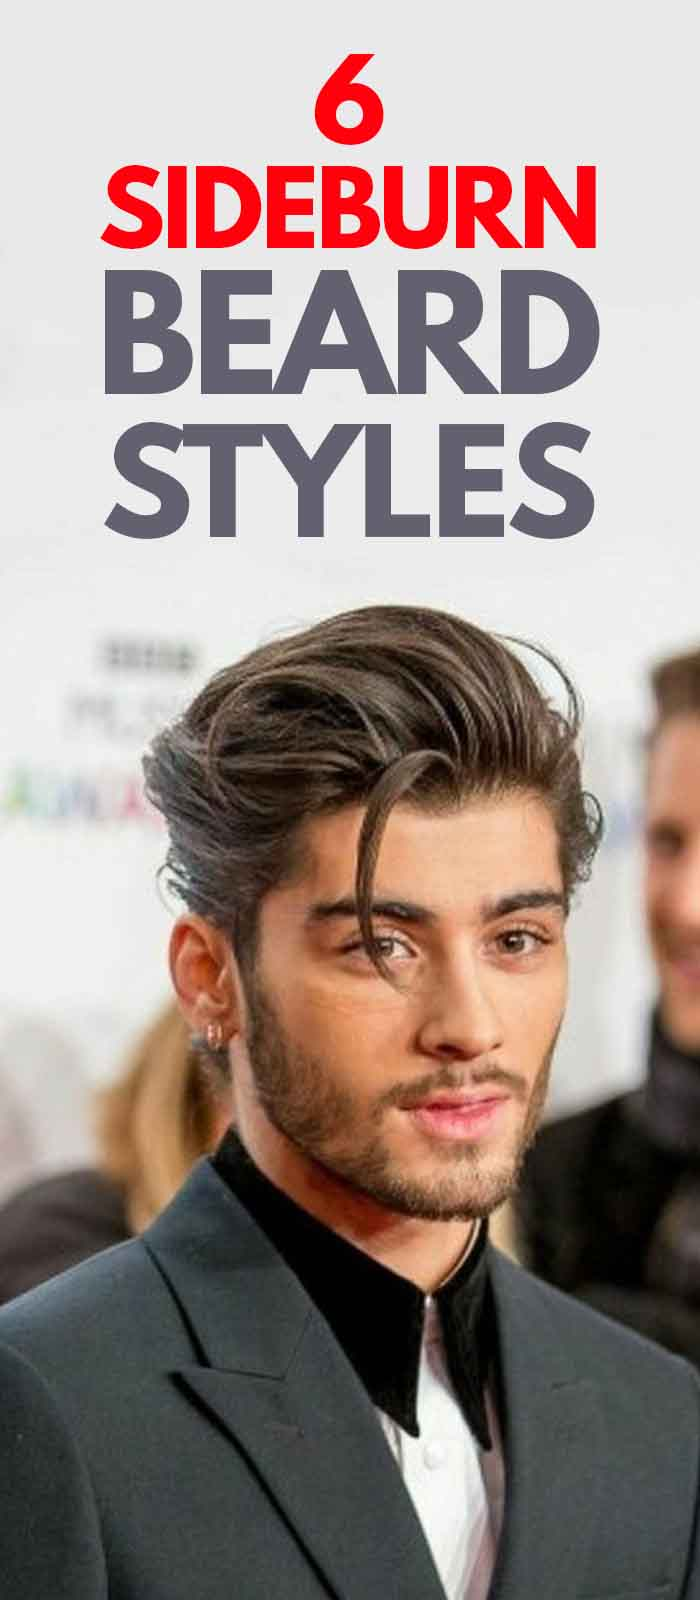 Zayn Malik Long Sideburn Style for men!